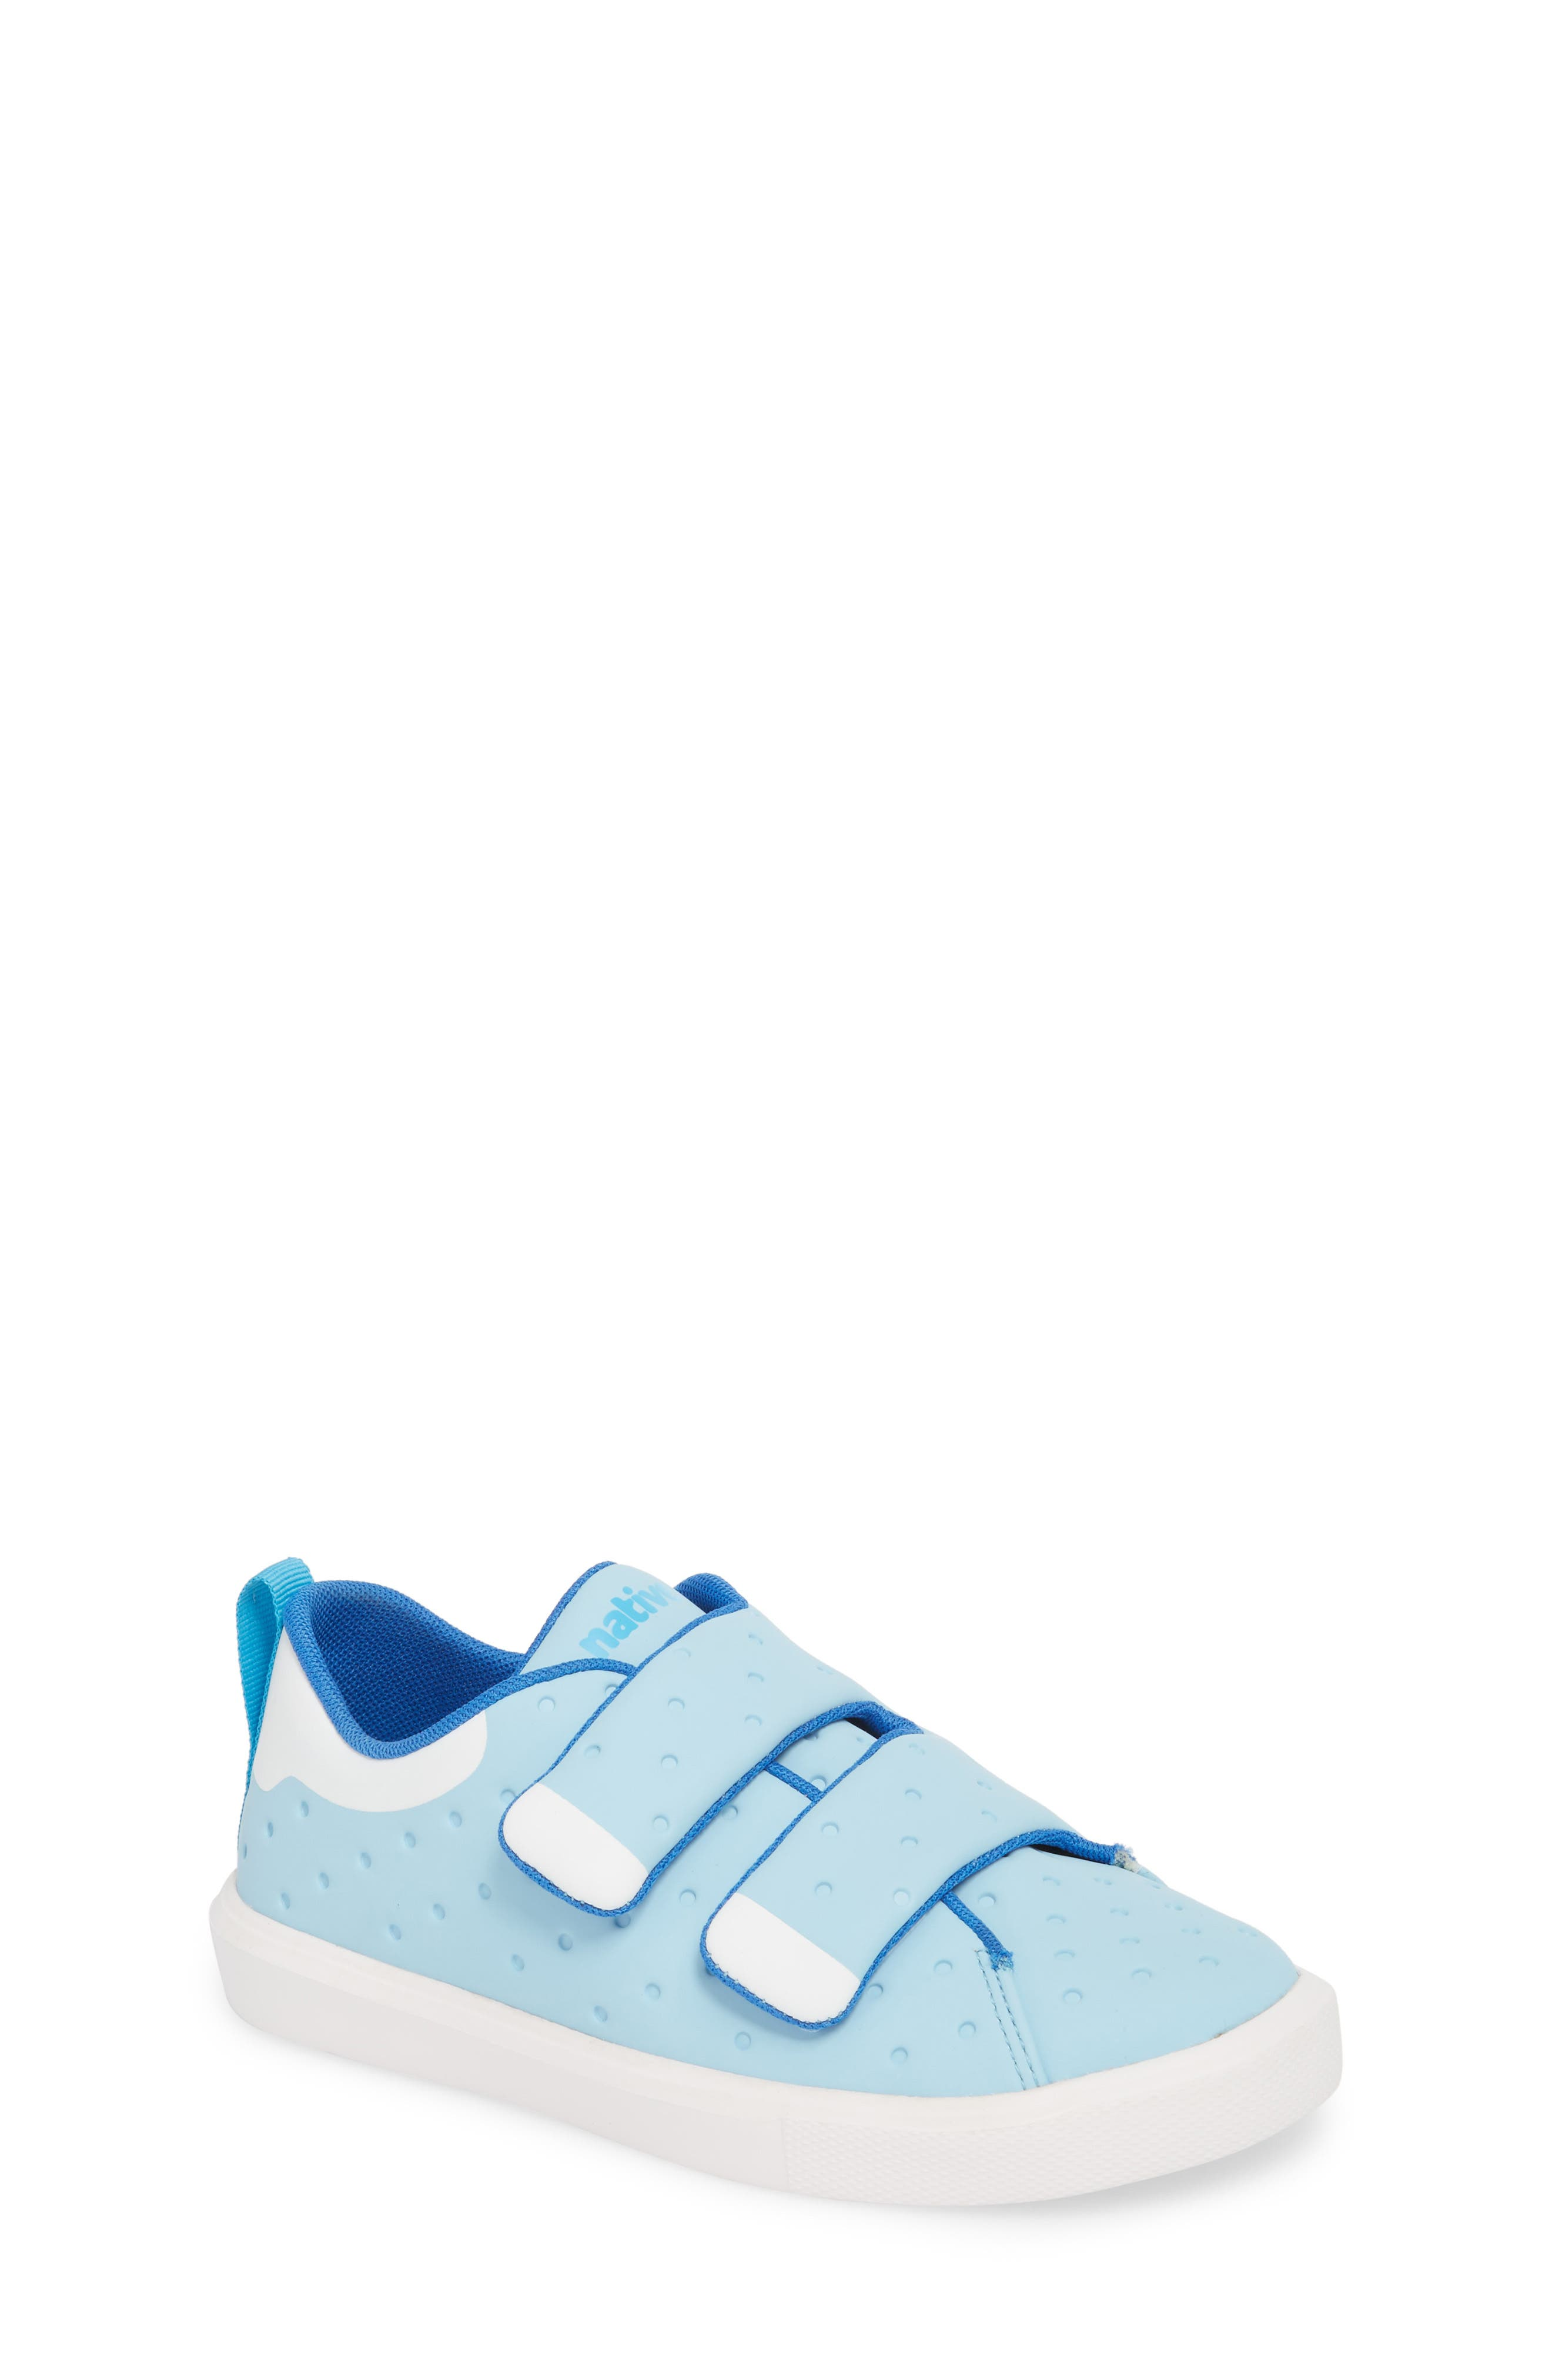 Monaco Sneaker,                             Main thumbnail 1, color,                             Sky Blue/ Shell White